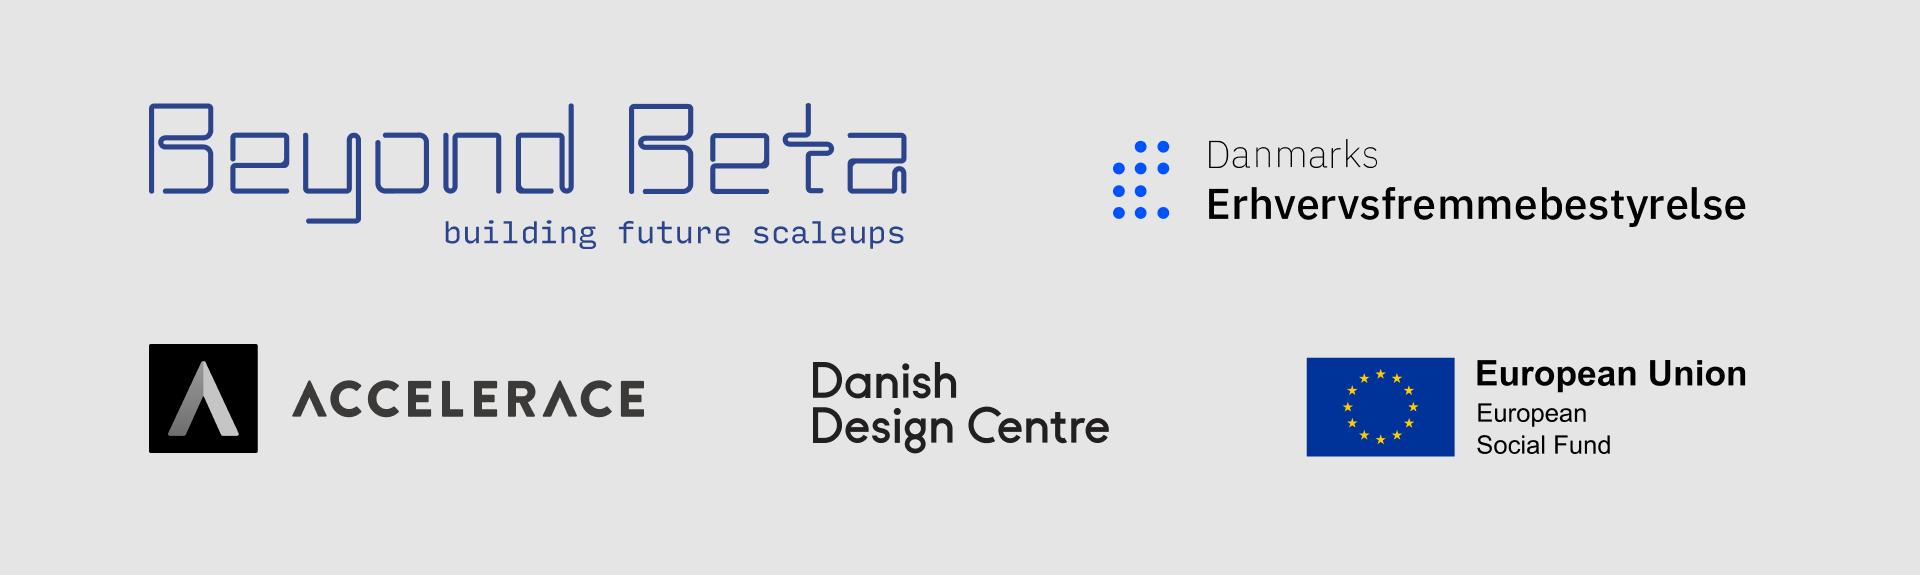 Beyond Beta, Accelerace, Danish Design Centre, Danmarks Erhvervsfremmebestyrelse, EU European Social Fund